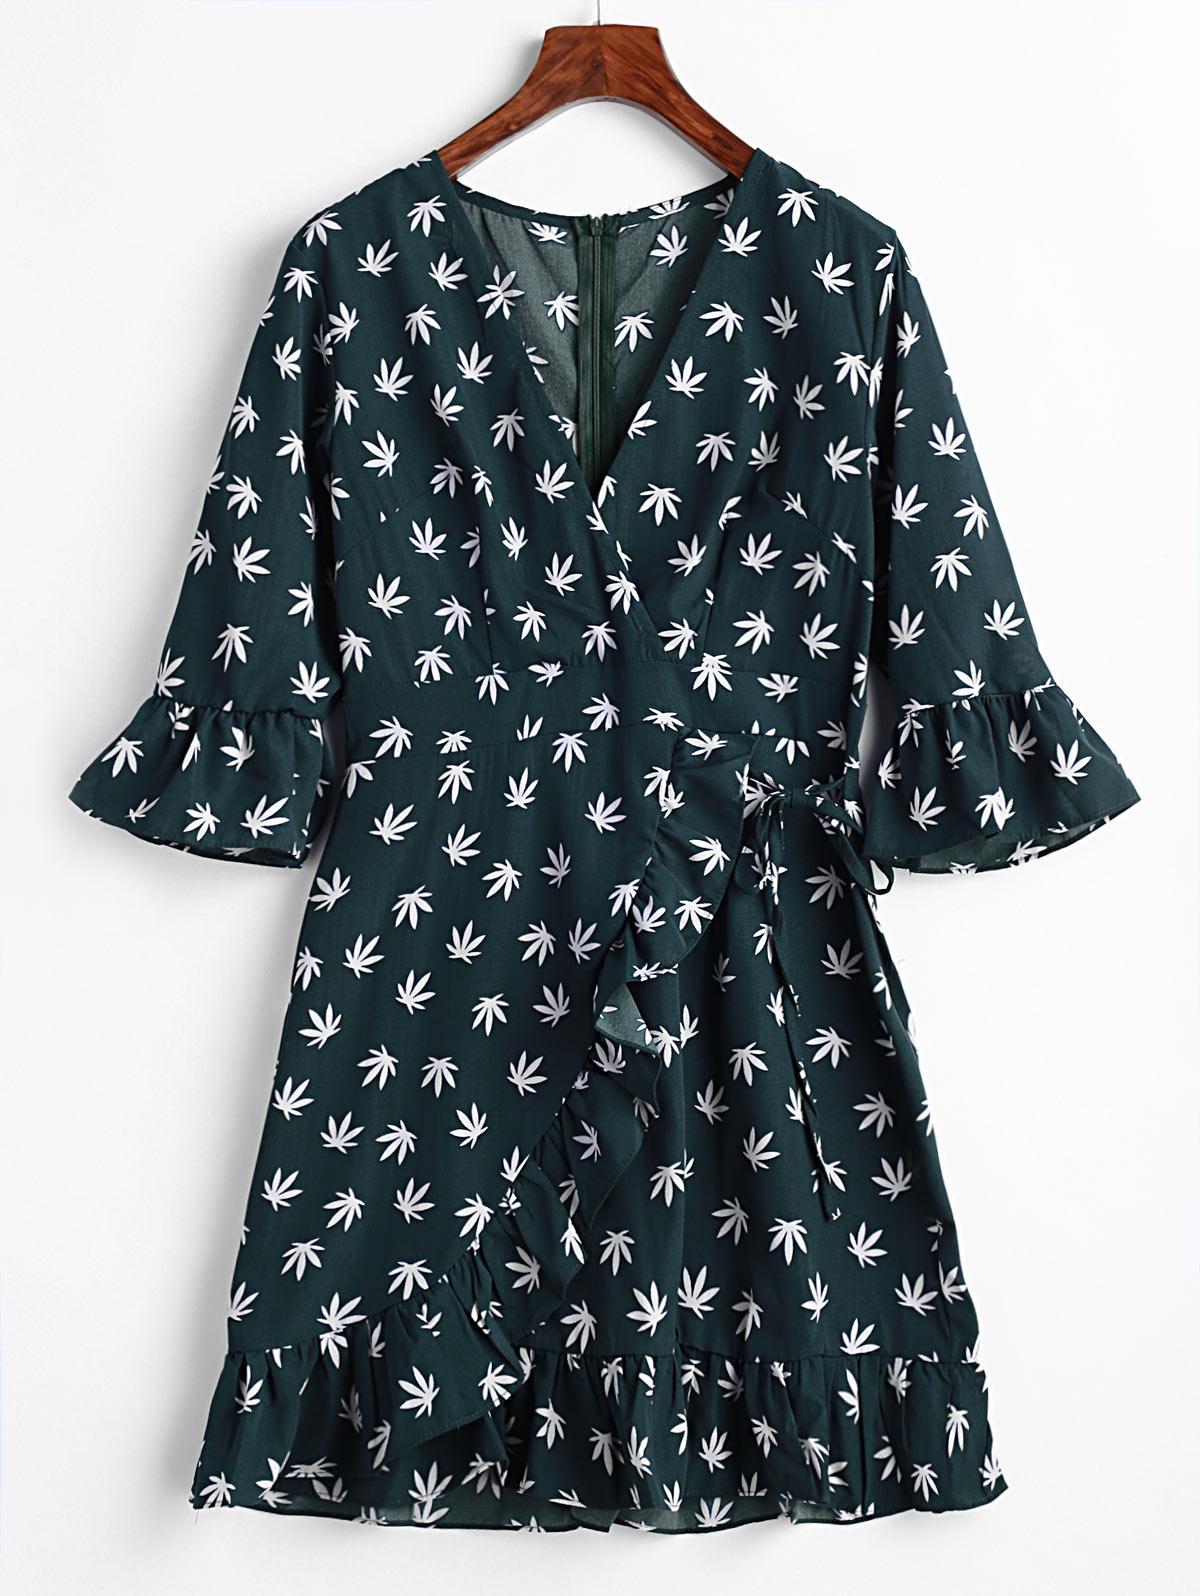 Leaves Print Ruffles Surplice Mini Dress, Grayish turquoise